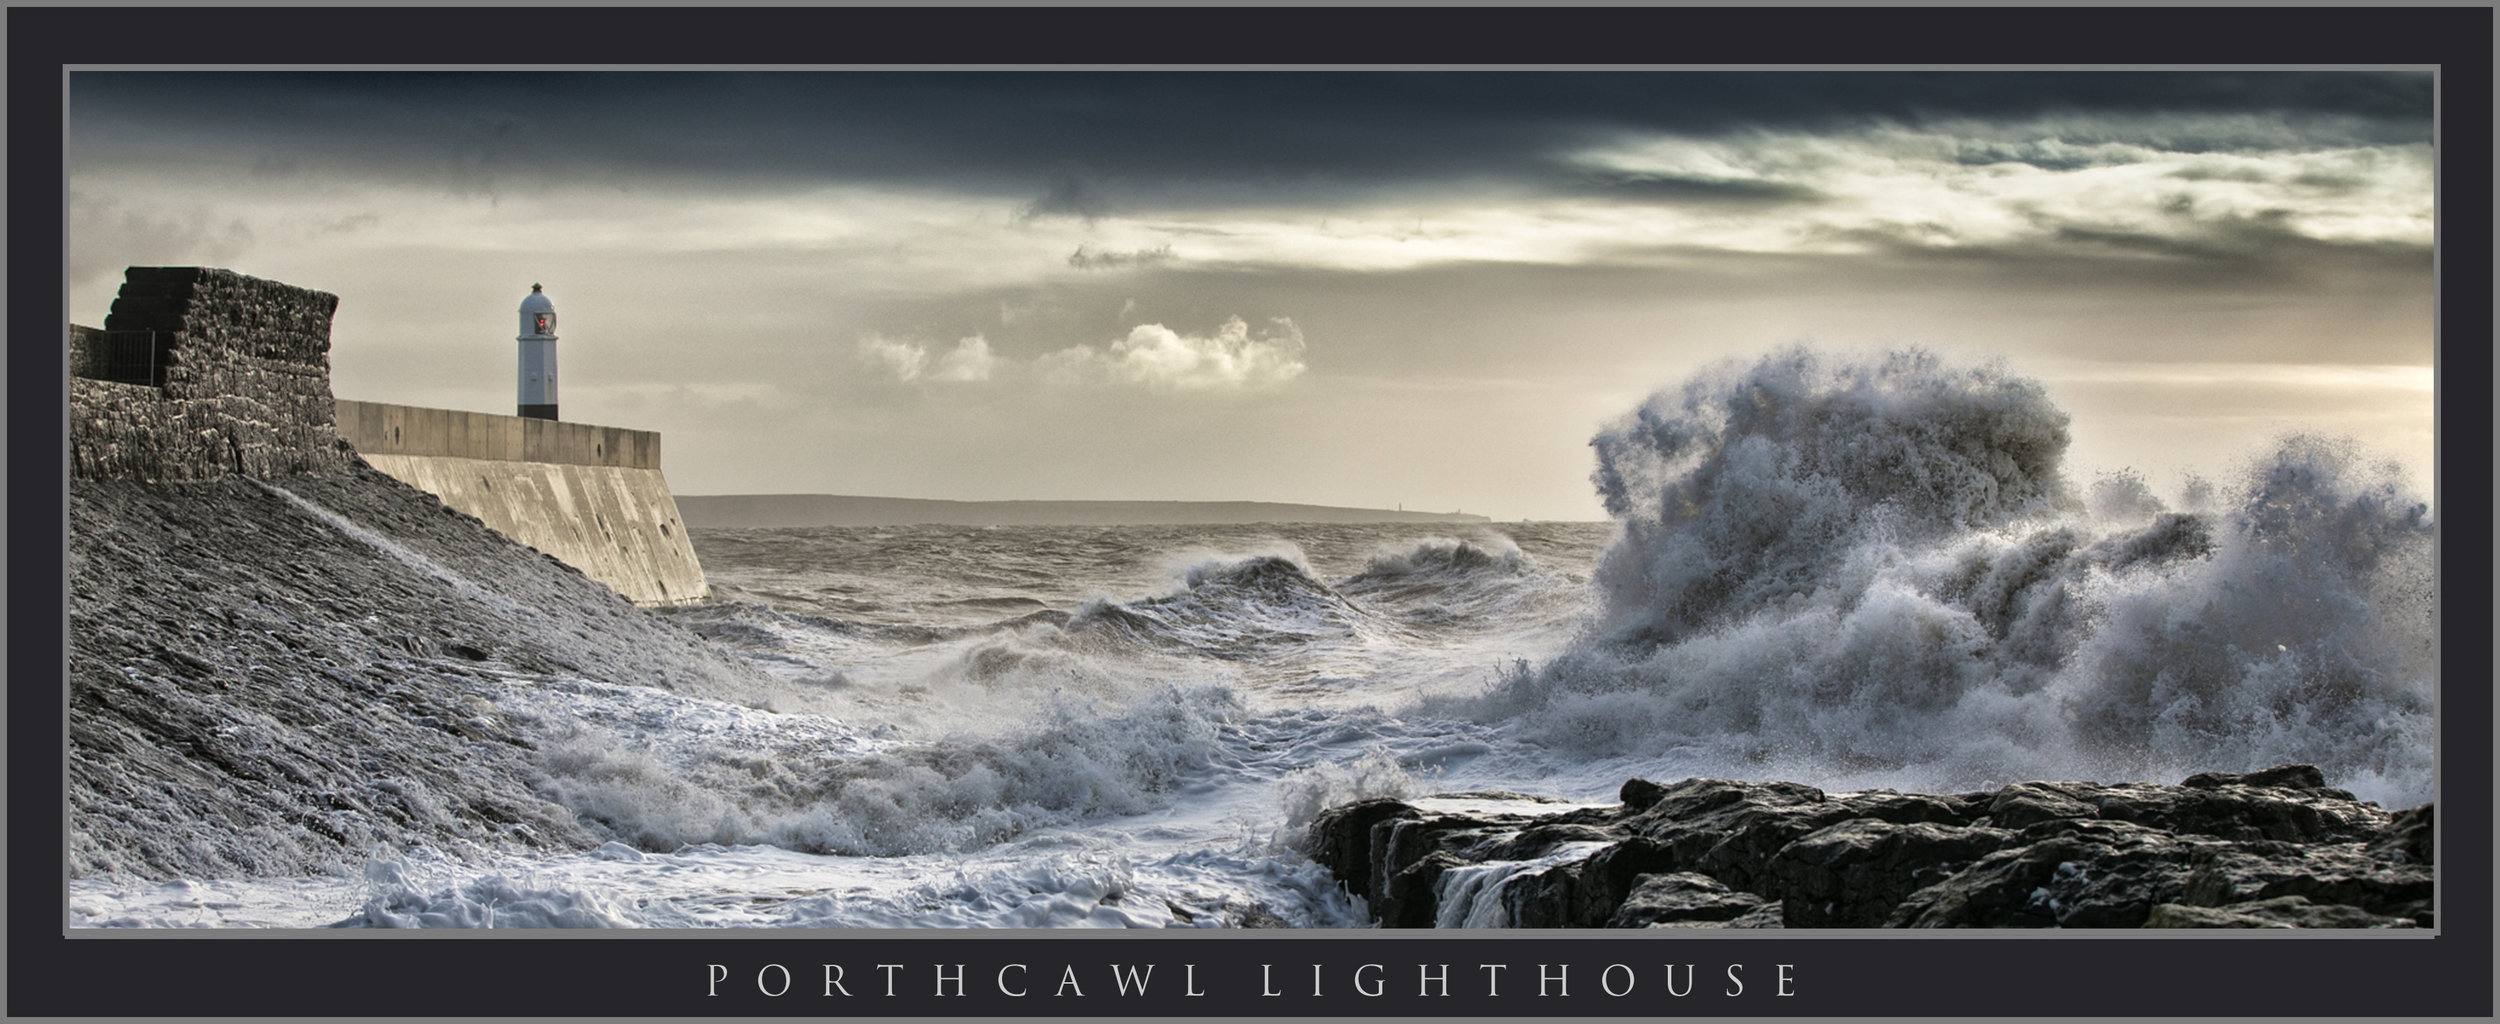 PORTHCAWL LIGHTHOUSE WALES (1).jpg